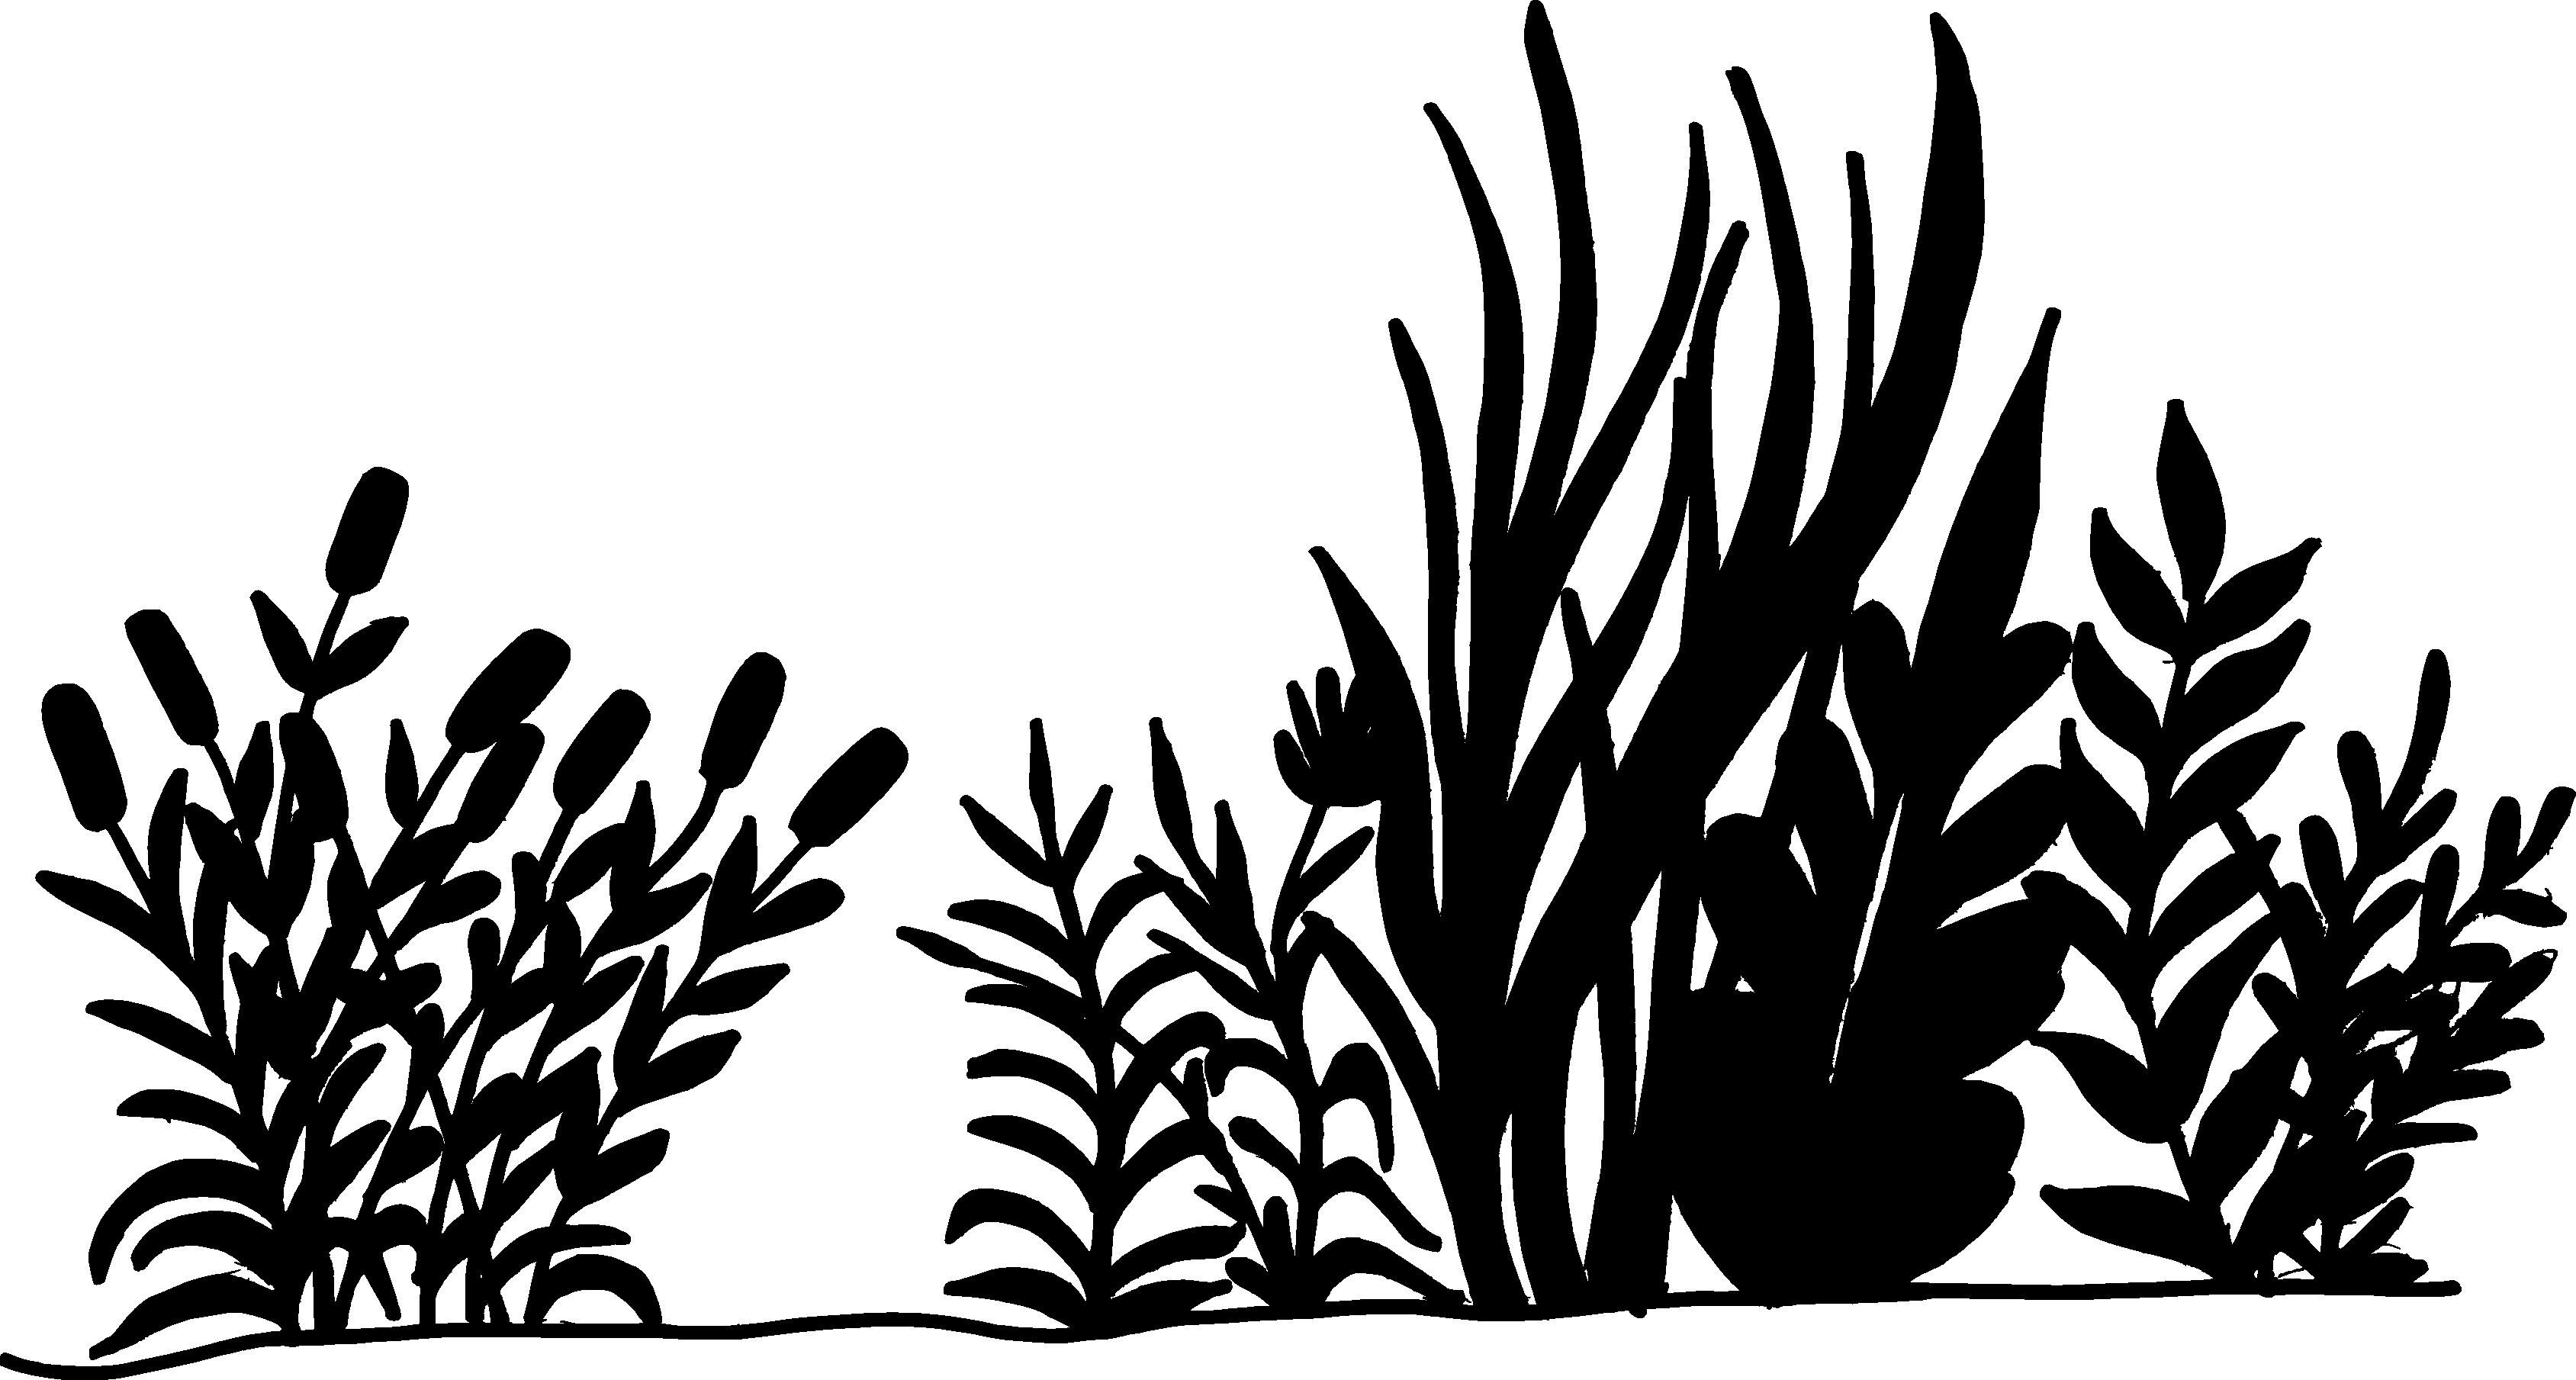 Clipart grass black and white. Silhouette desktop wallpaper clip